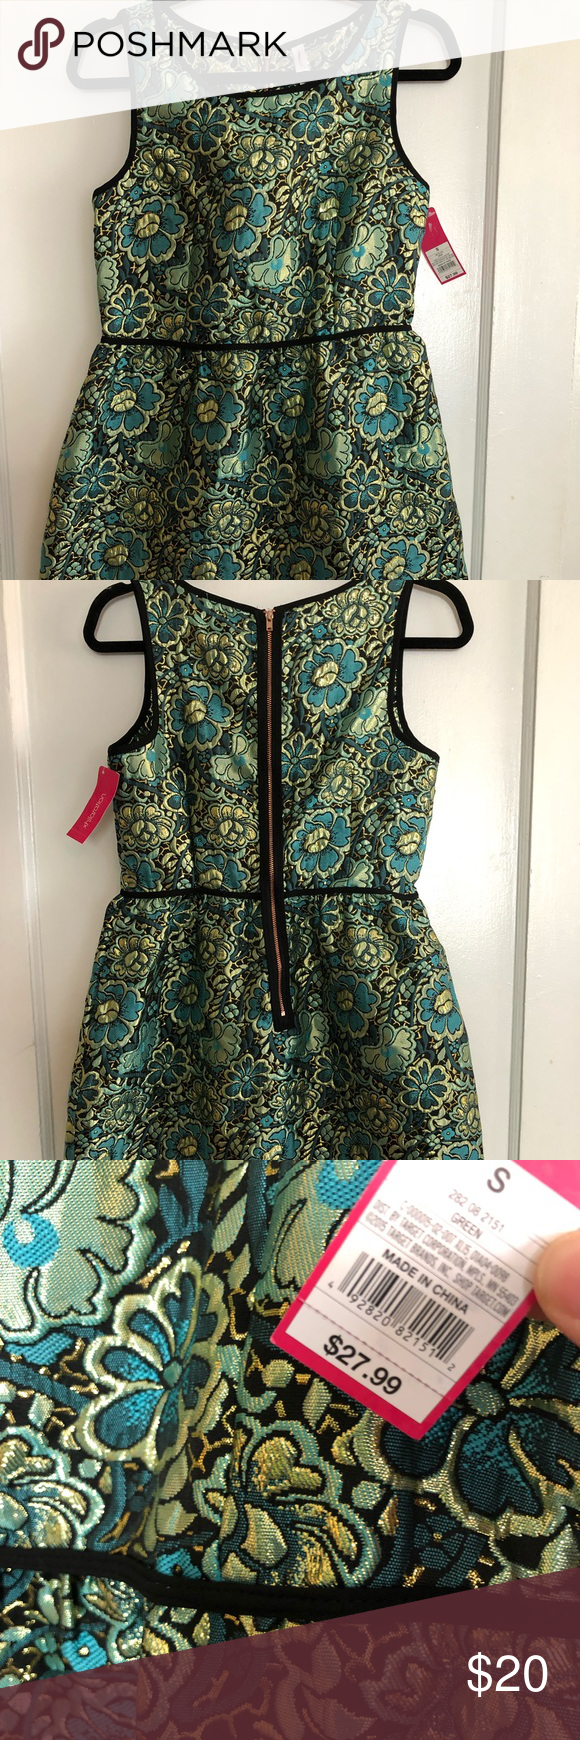 Xhilaration Gilded Target Dress Target Dress Clothes Design Dresses [ 1740 x 580 Pixel ]